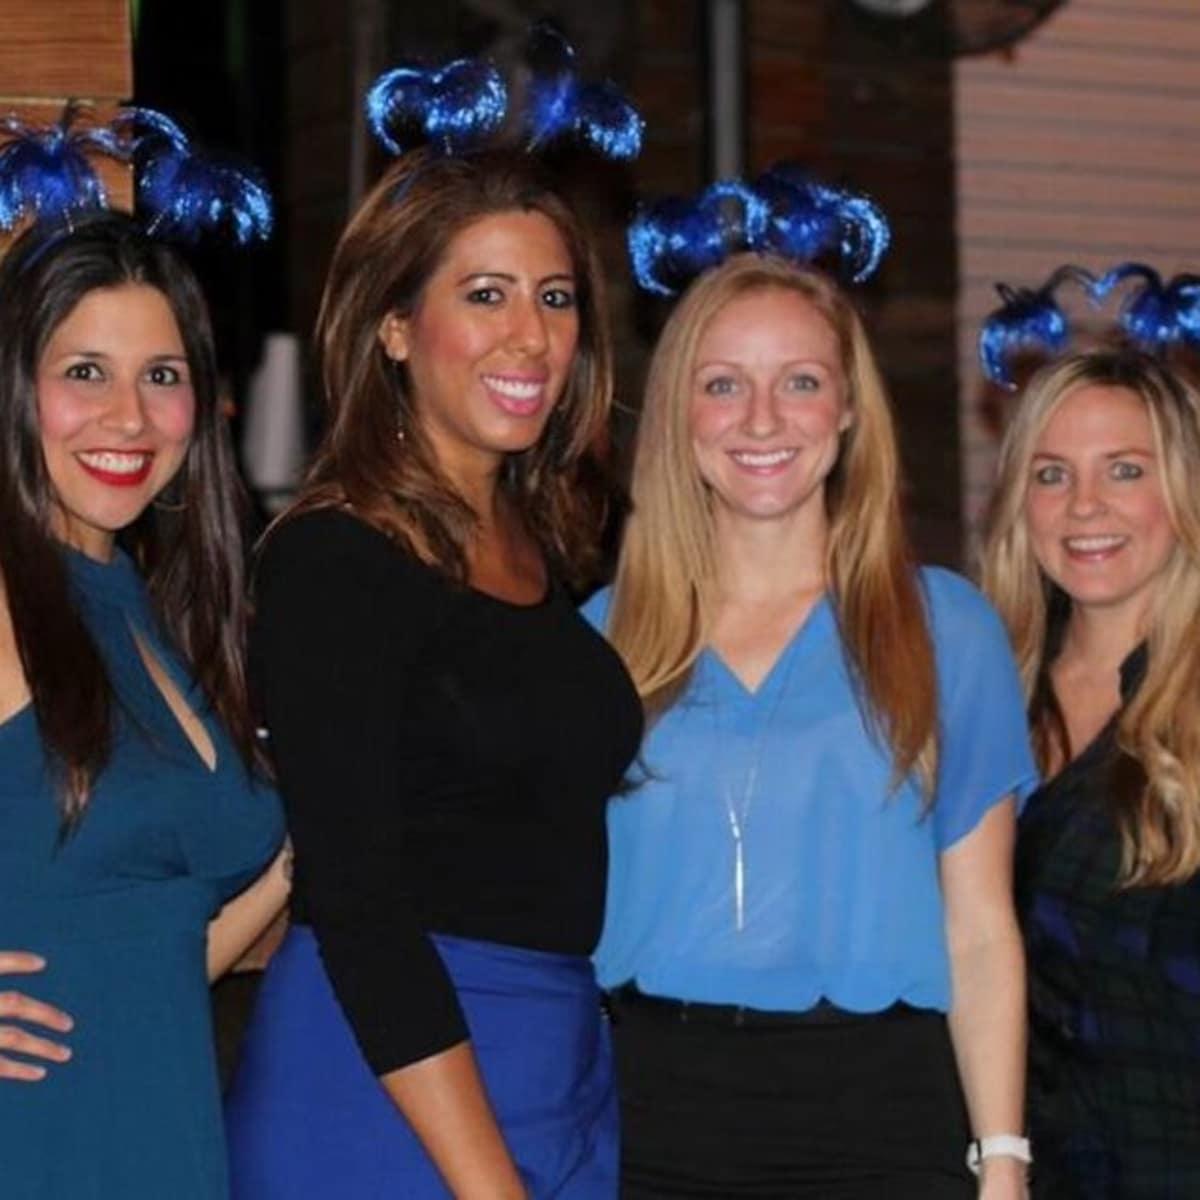 Beat the Blues Crisis Intervention Angelique Sanchez, Trini Silva, Erika Hughes, Kyleen Broxson